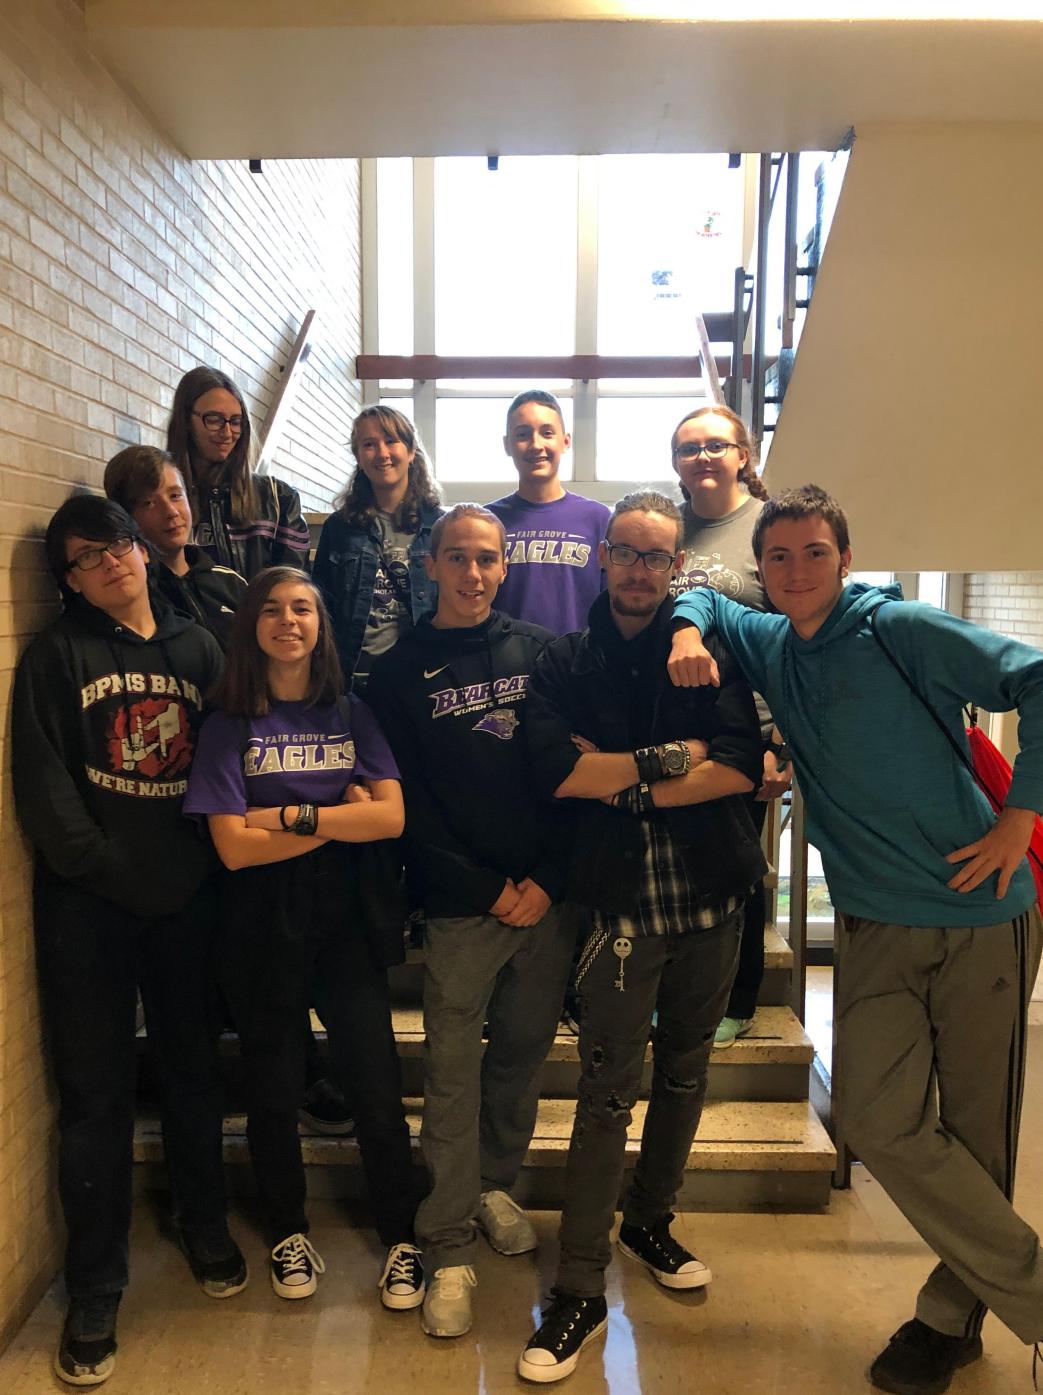 The Scholar bowl team posing as they celebrate their season